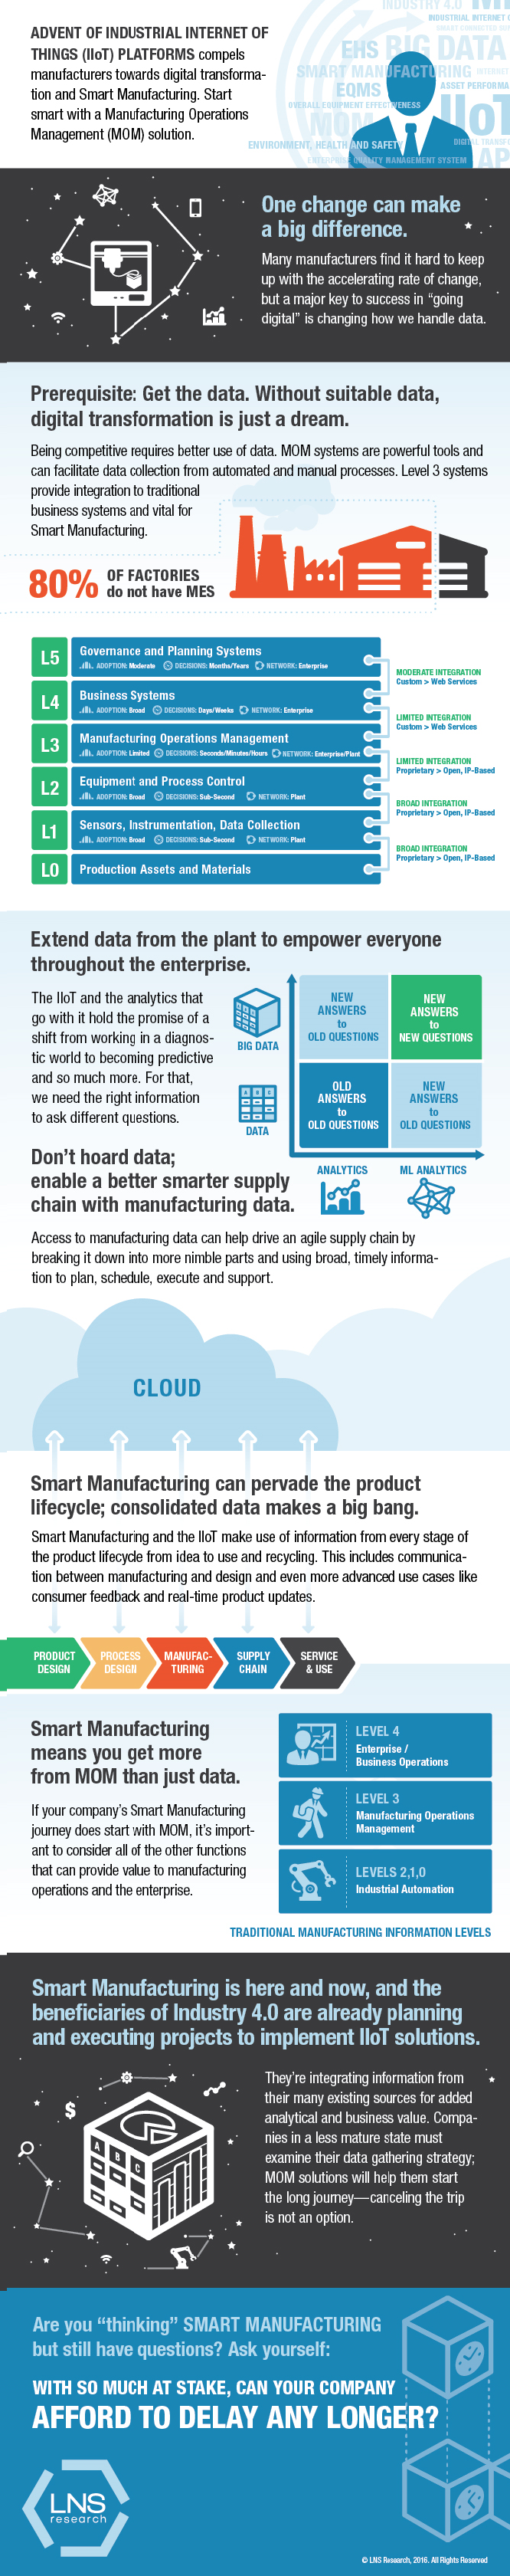 LNS_SmartManufacturing2.png